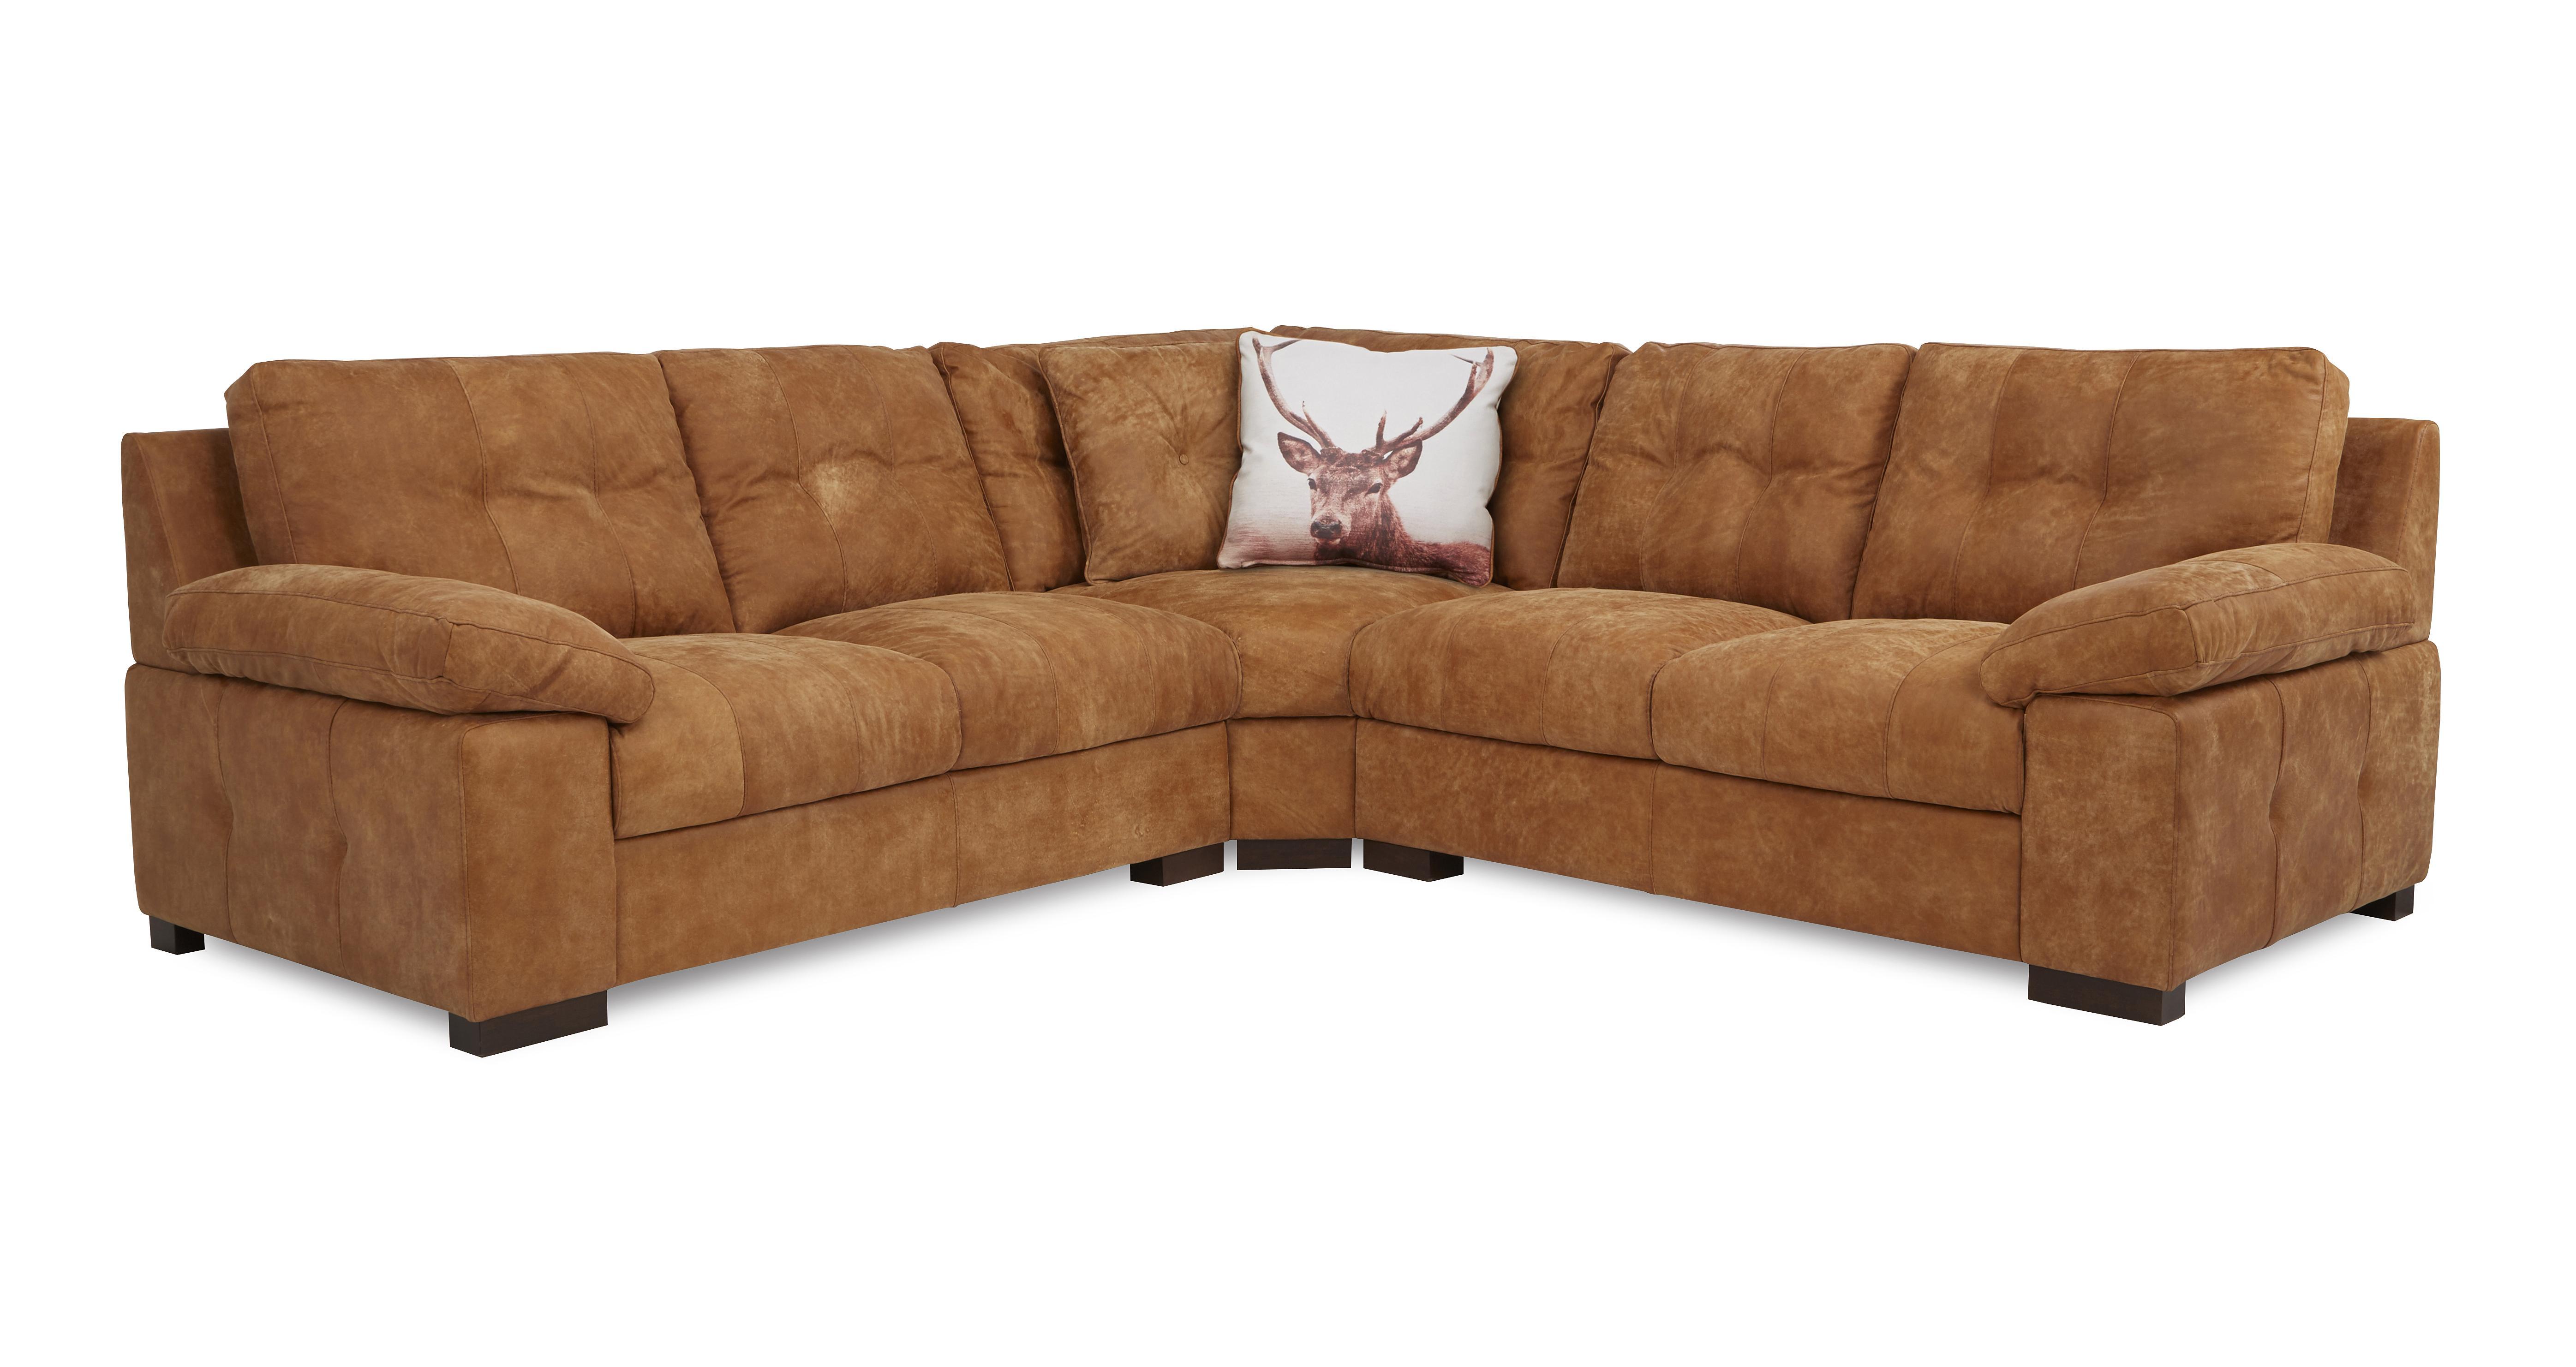 sofasworld showroom sofa mart springfield missouri leather showrooms birmingham functionalities net dfs corner sofas